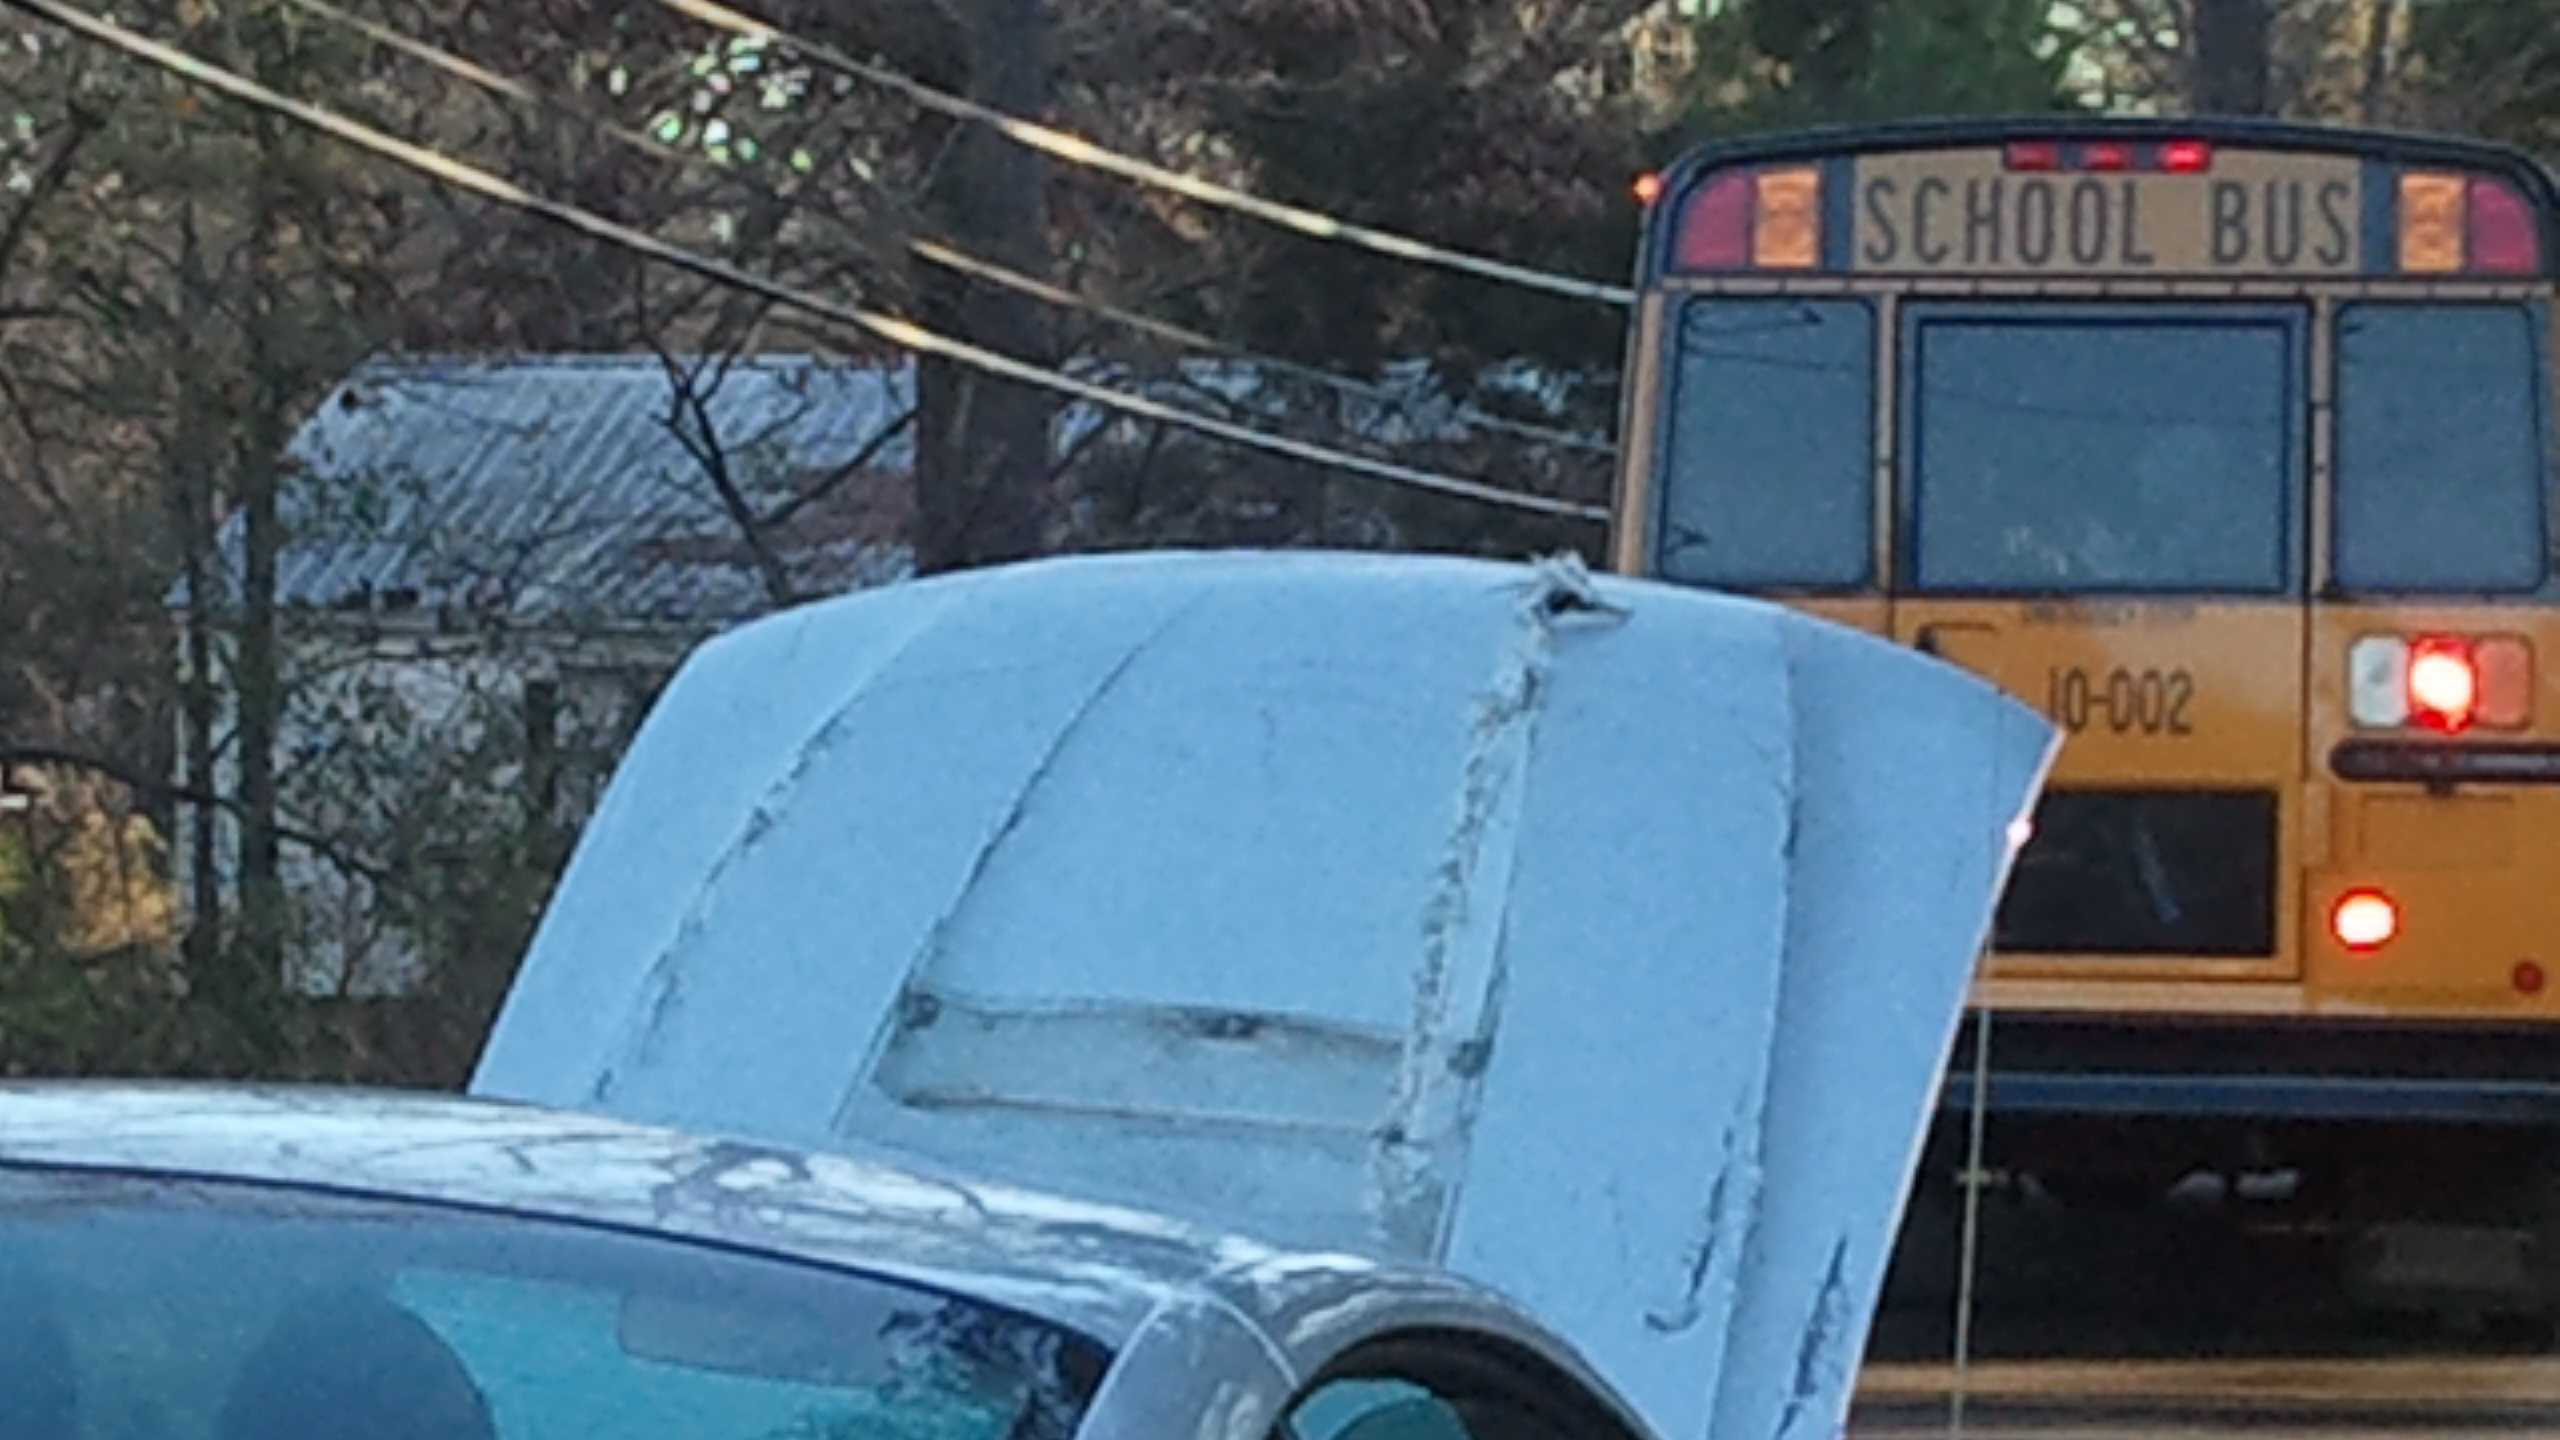 School bus ax gardenia 2